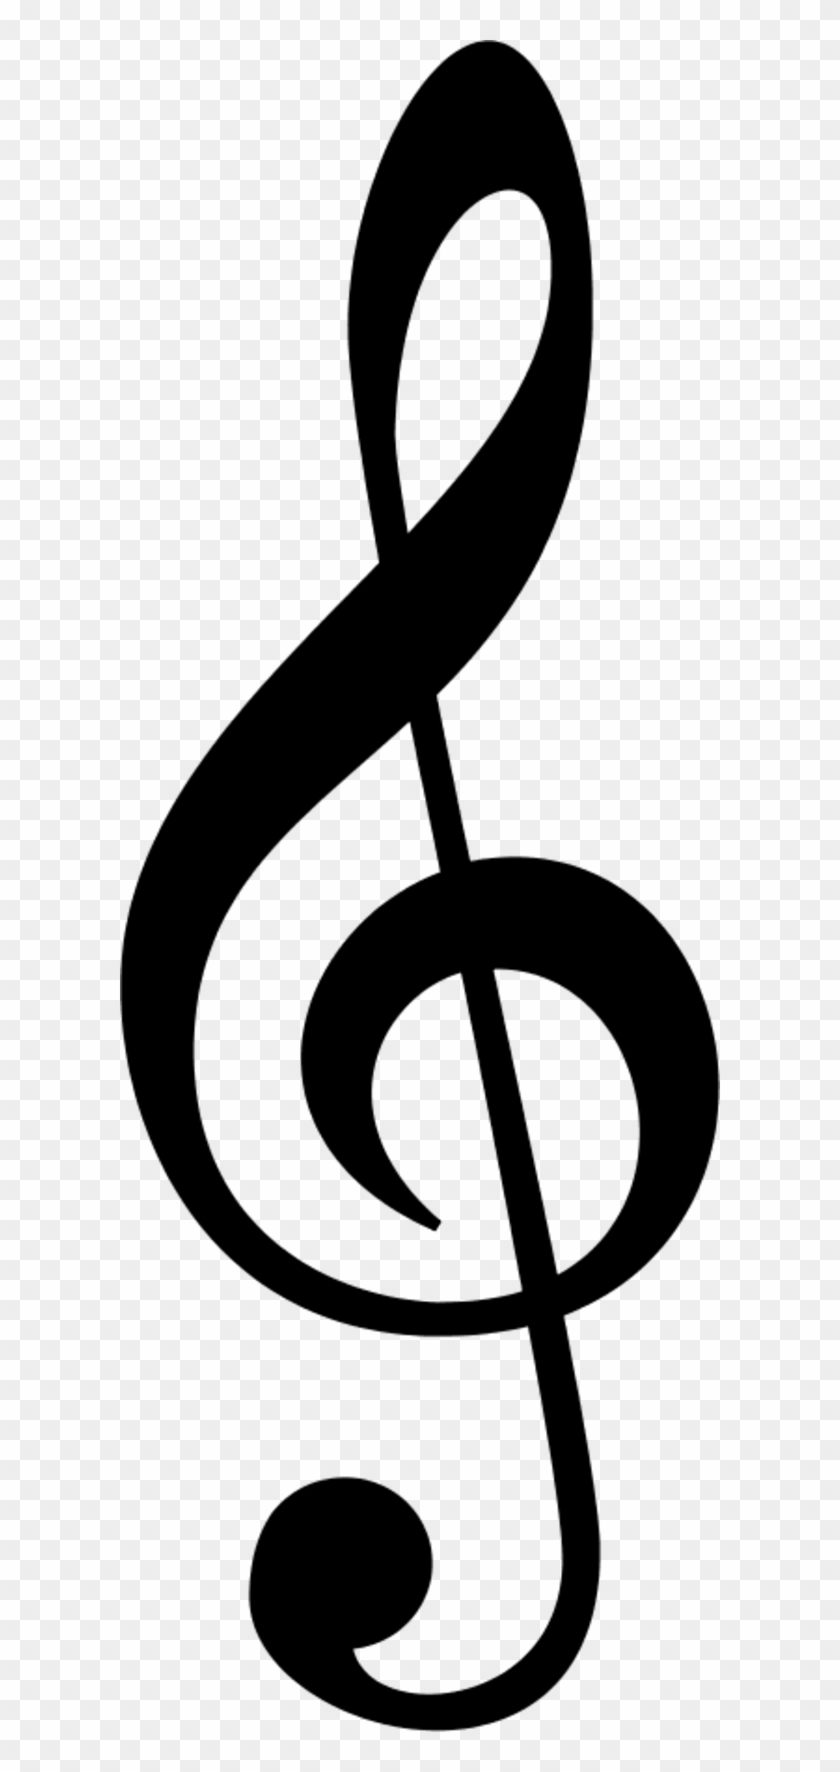 Free Music Note Clipart - Imagen De Una Nota Musical #9454